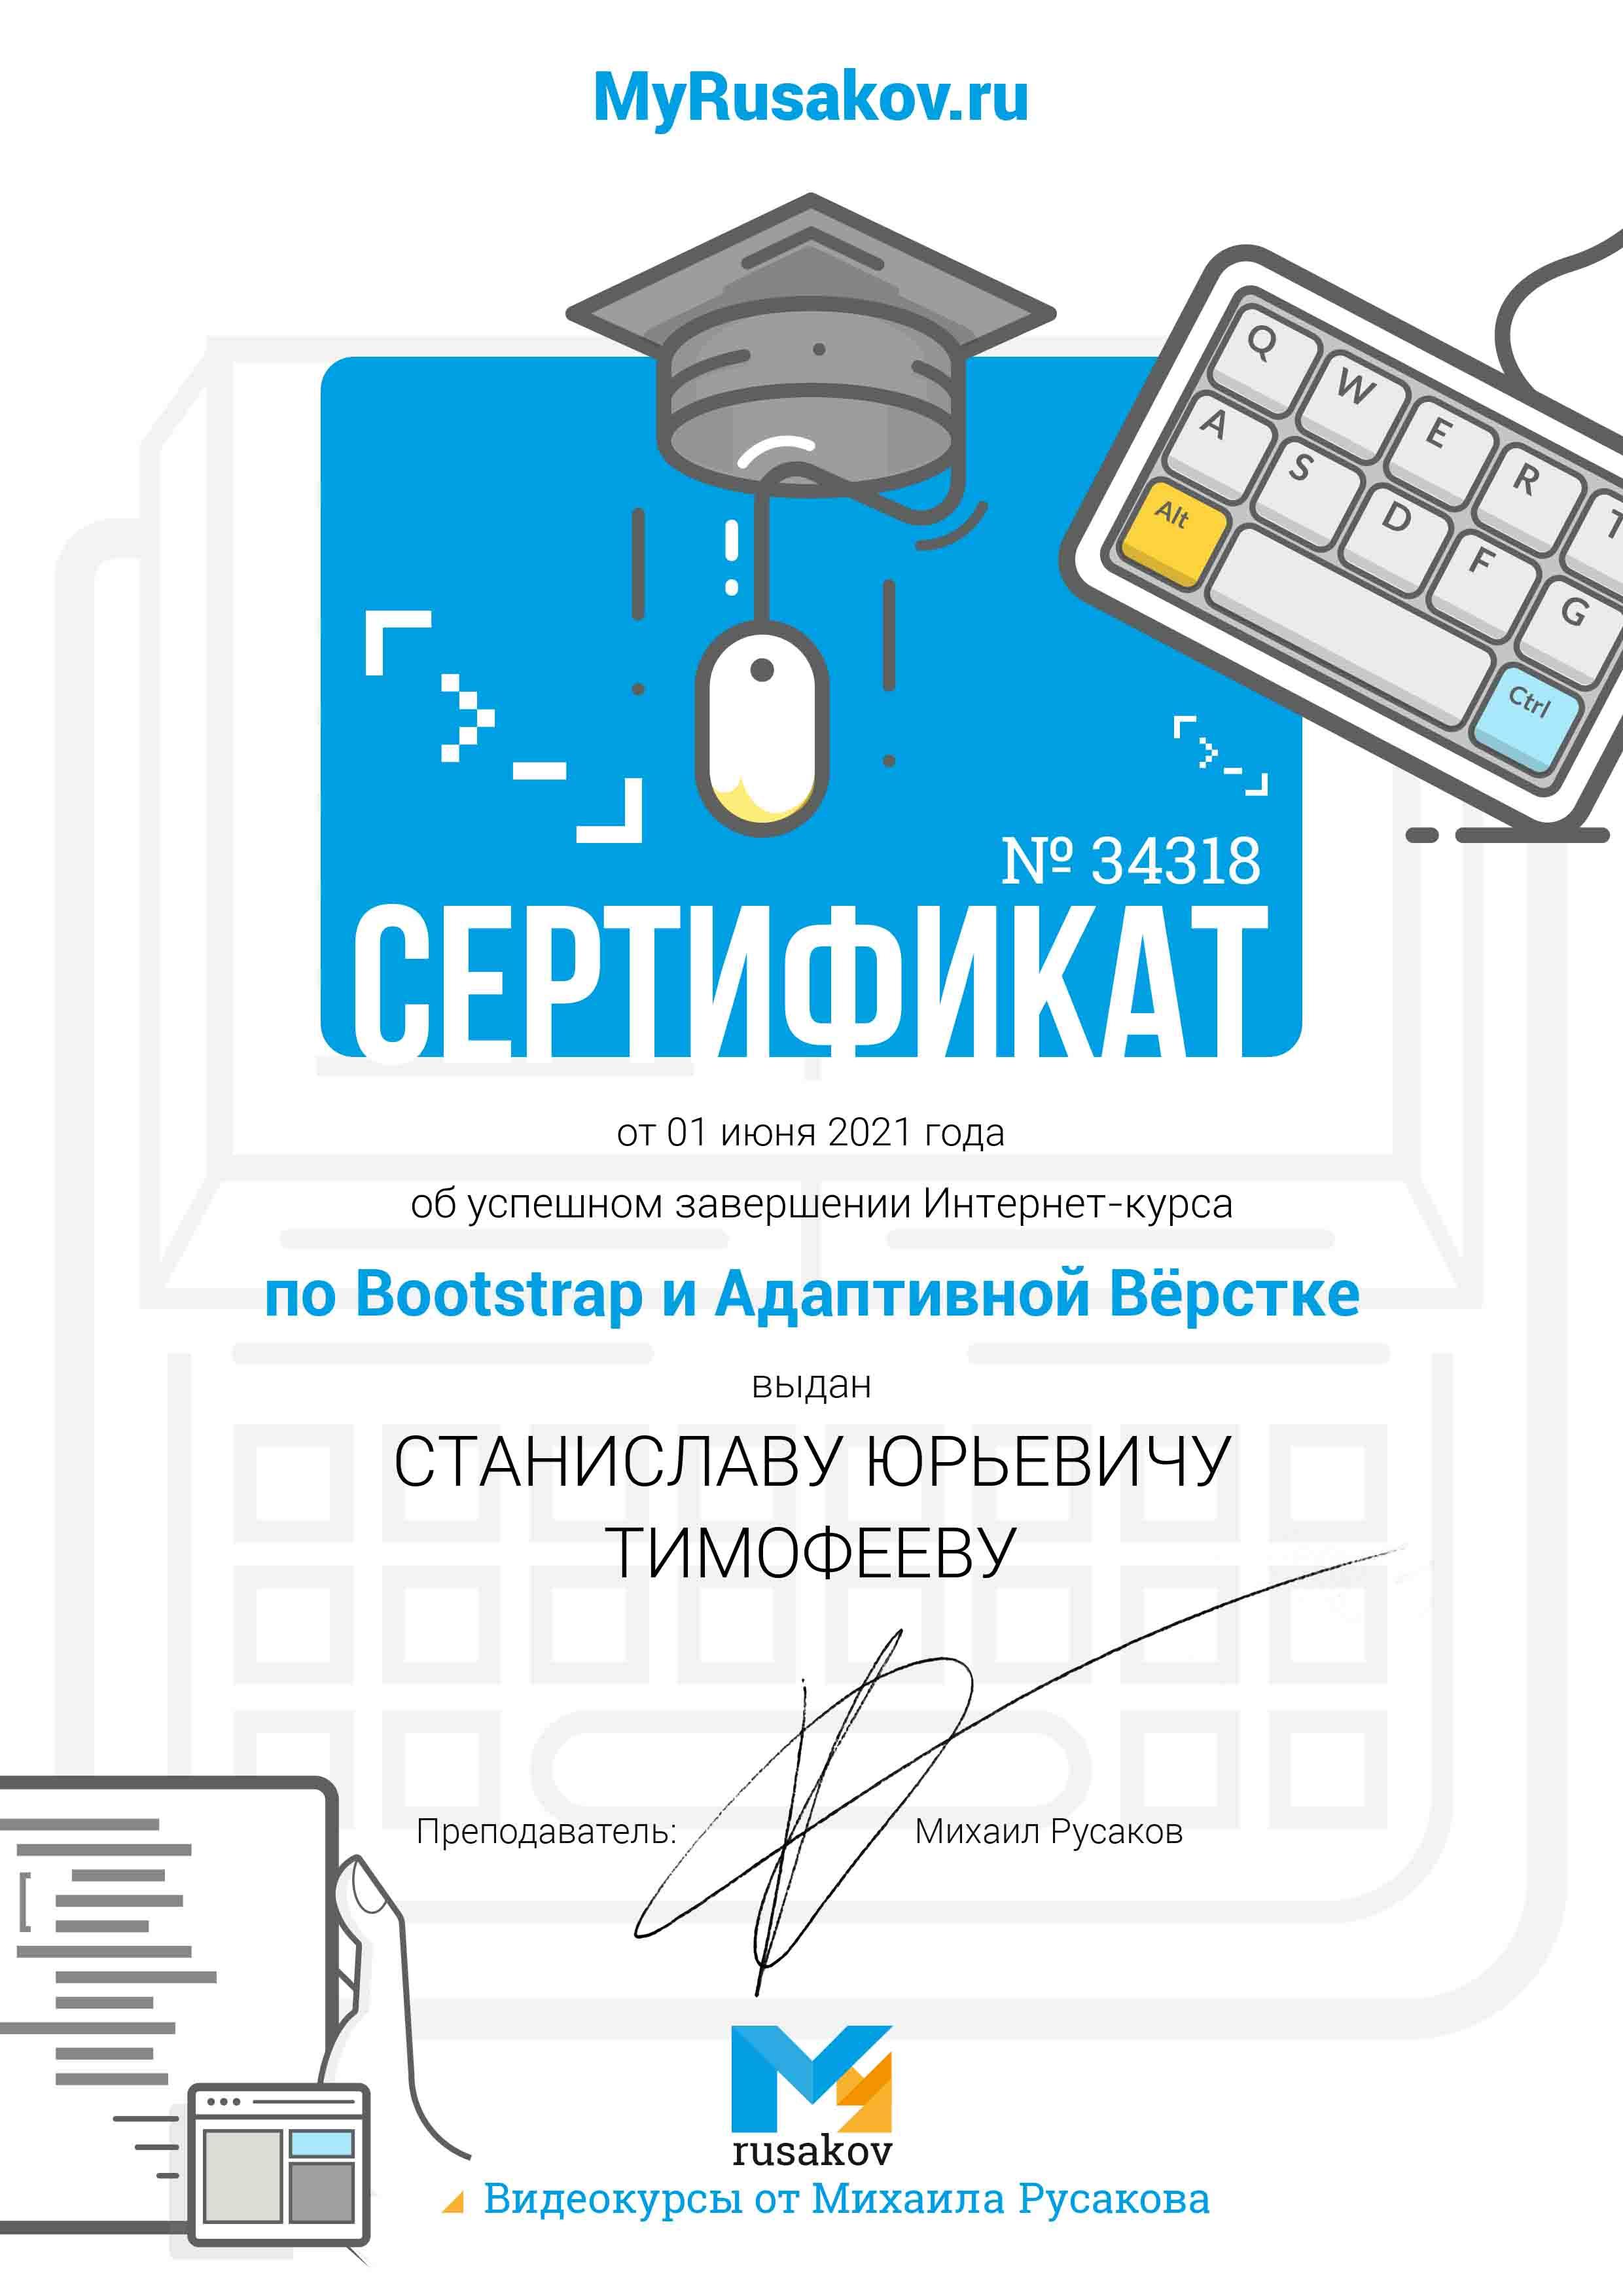 сертификат по bootstrap